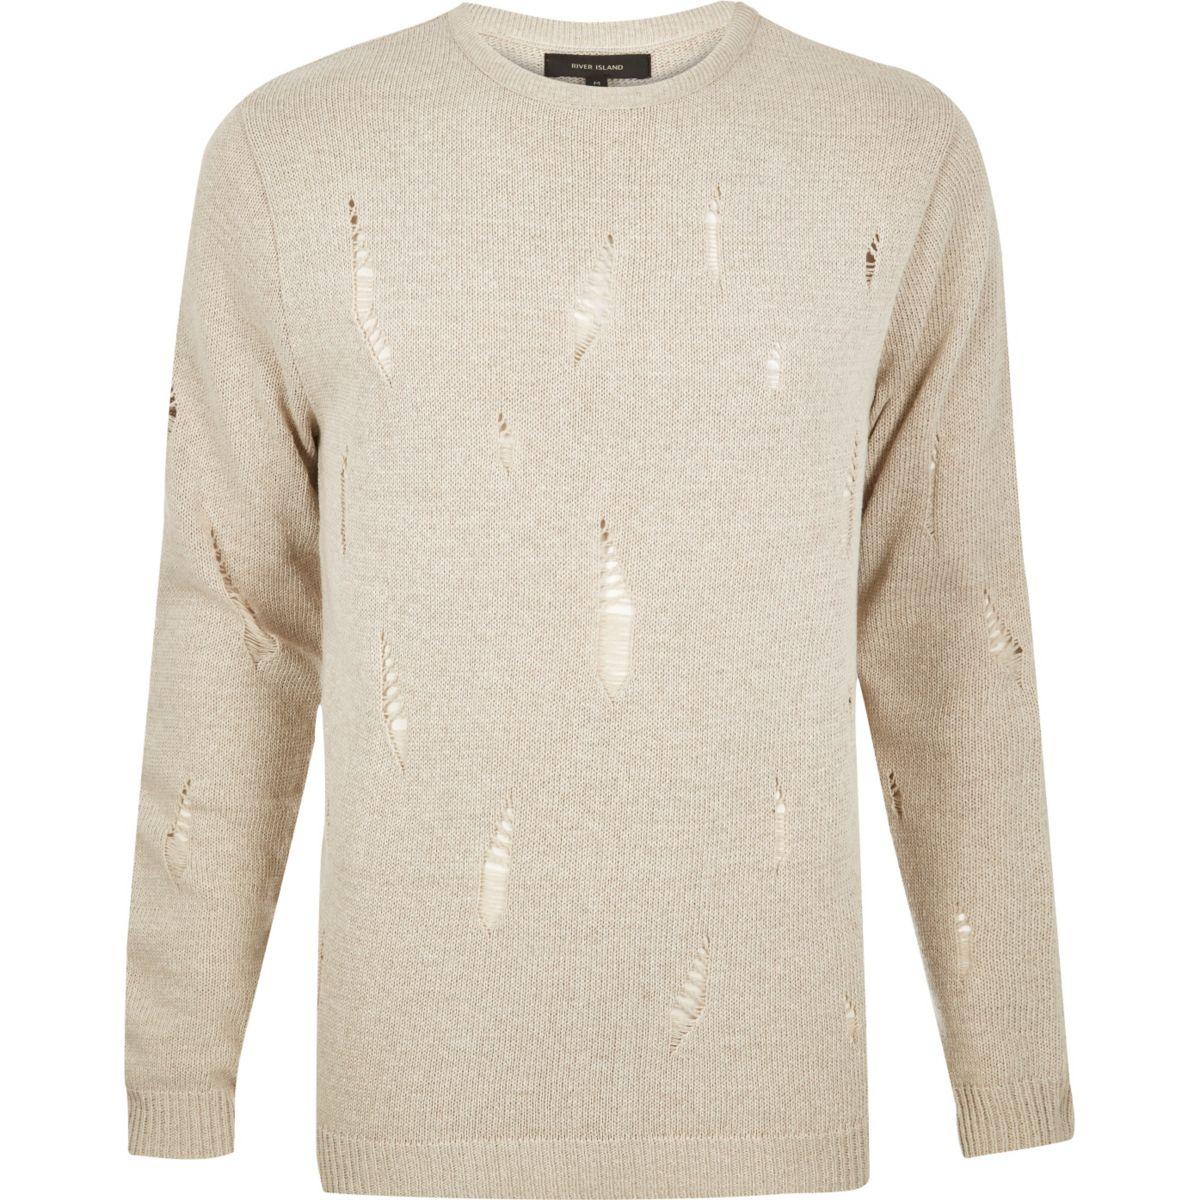 Stone distressed knit sweater